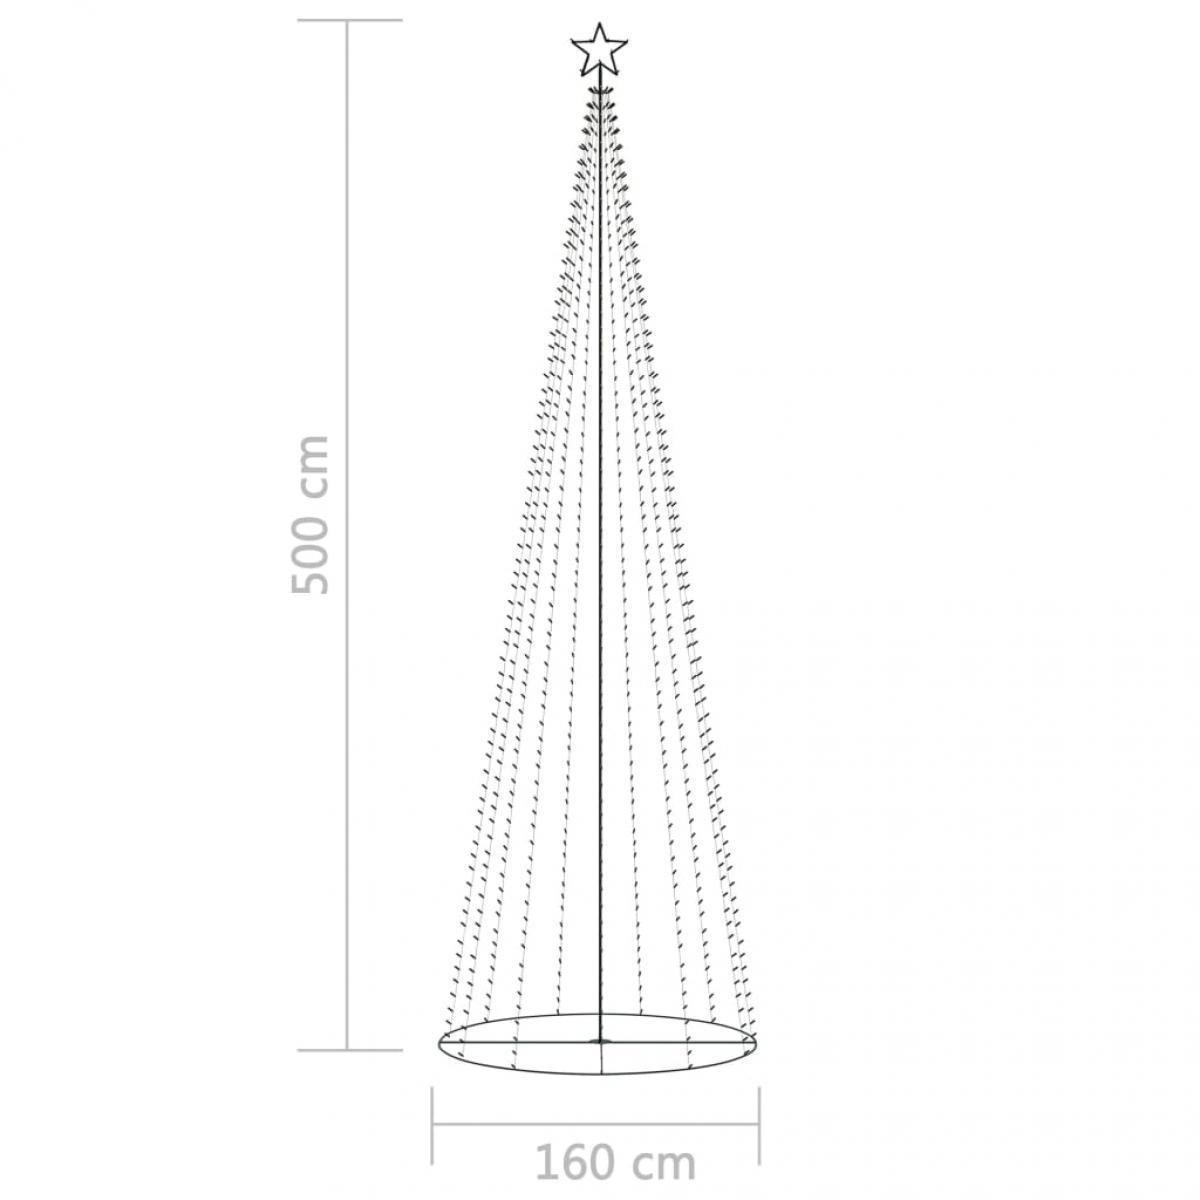 Árbol Navidad cono 752 LEDs blanco cálido adorno 160x500 cm